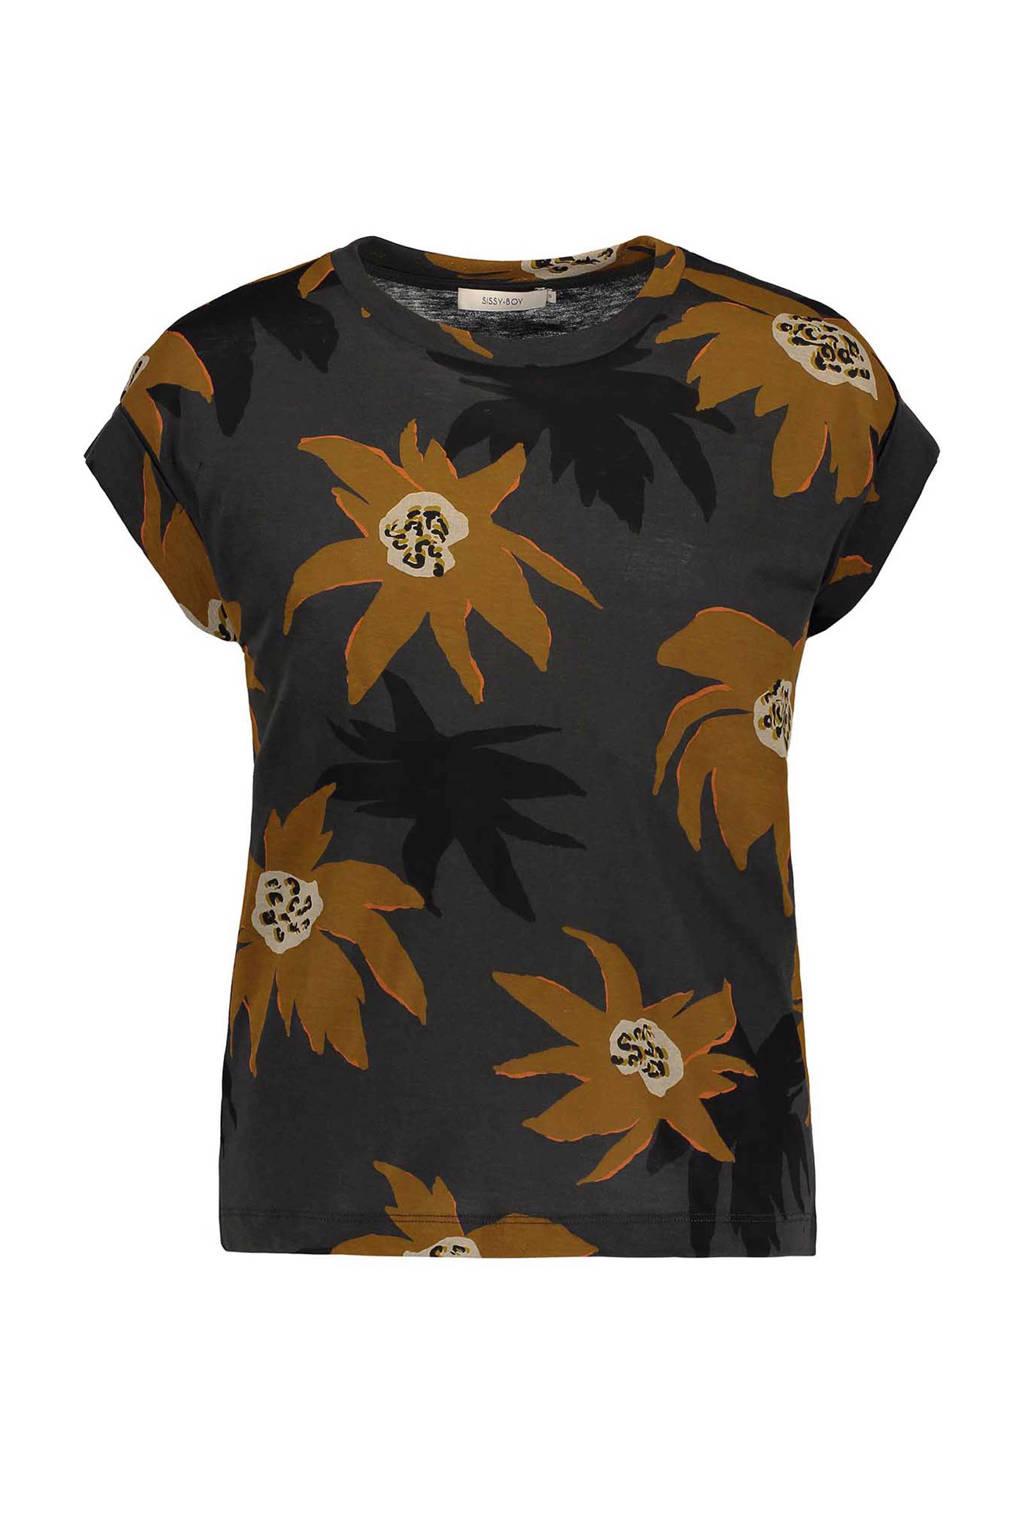 Sissy-Boy T-shirt, Antraciet/geel